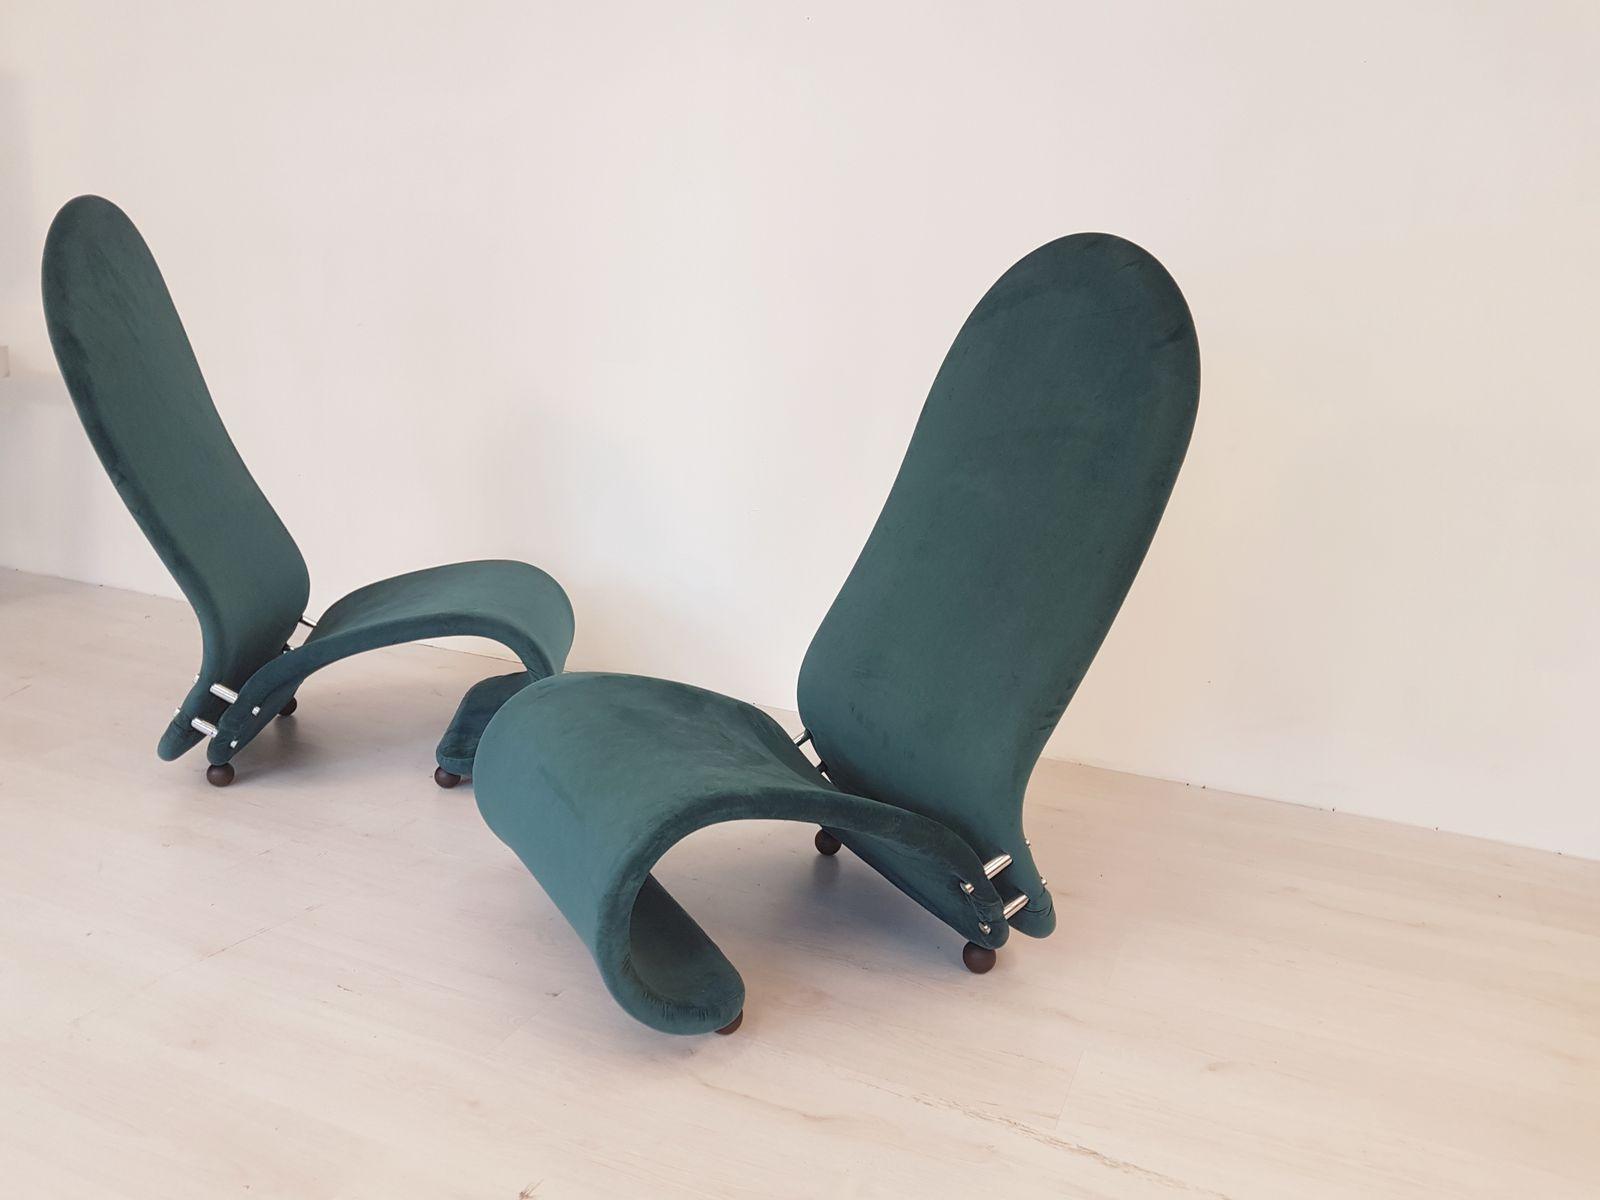 modell g sessel von verner panton f r fritz hansen 1970er 2er set bei pamono kaufen. Black Bedroom Furniture Sets. Home Design Ideas